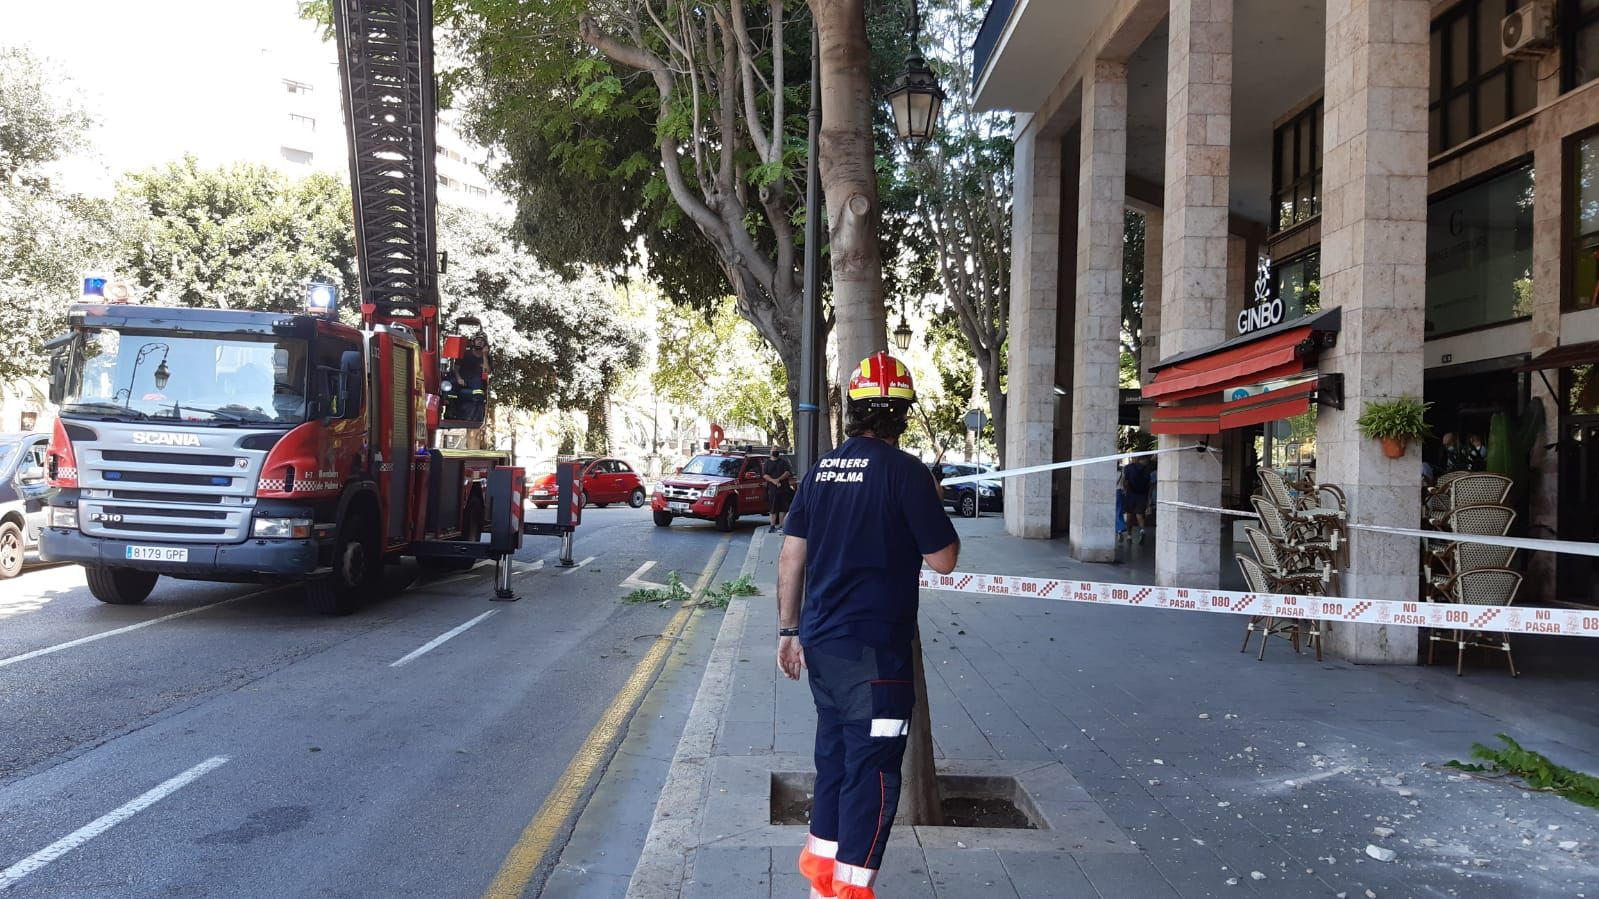 Desprendimiento de cascotes en una fachada de Paseo Mallorca